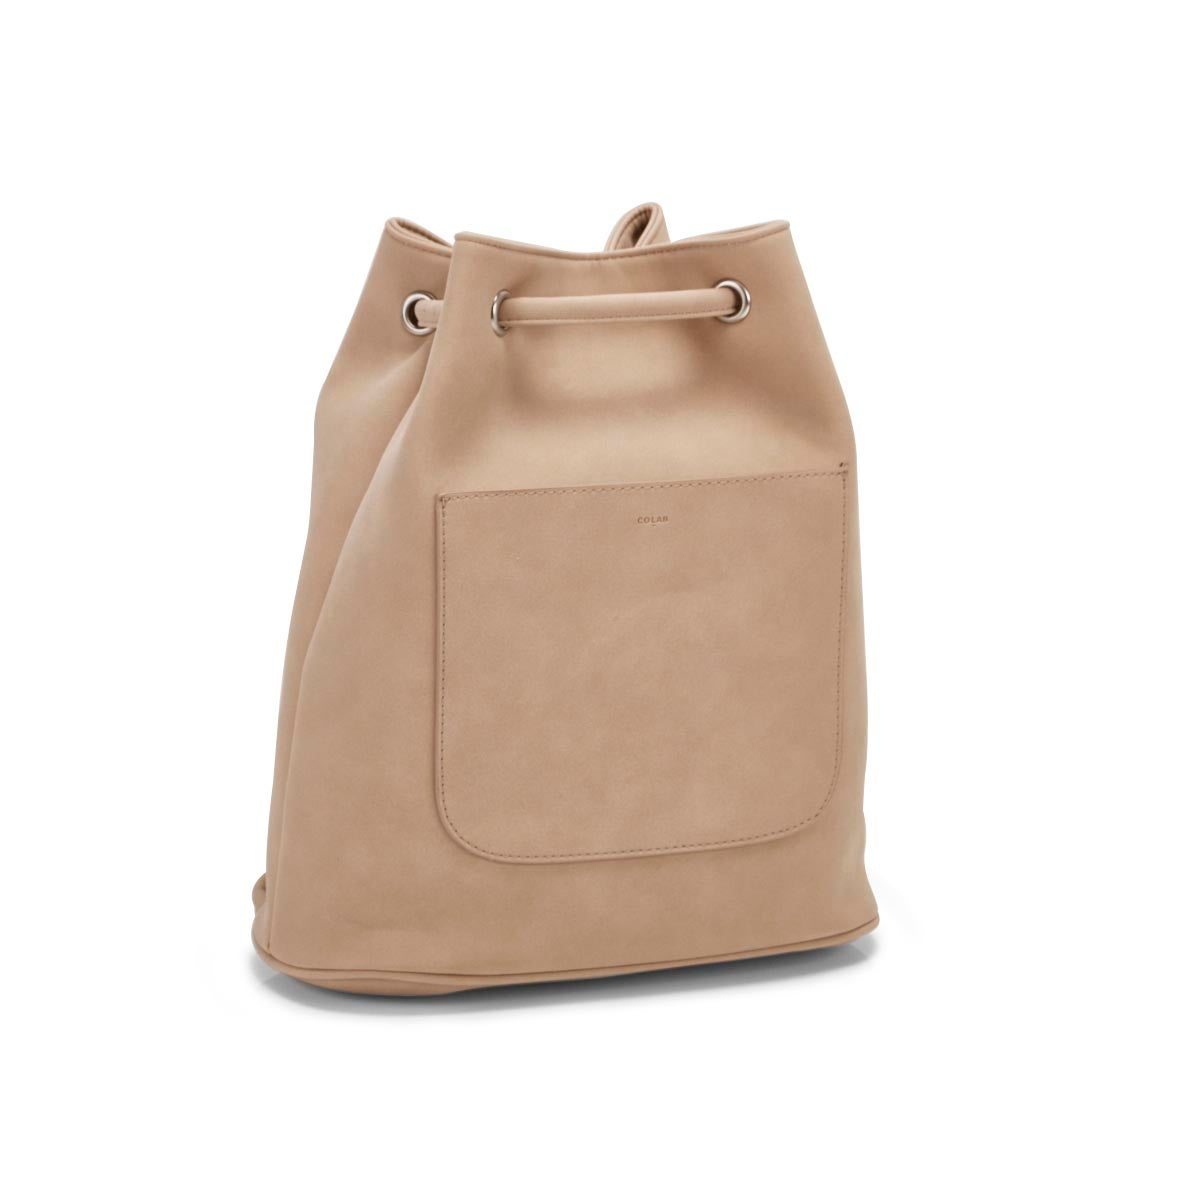 Lds sand drawstring backpack